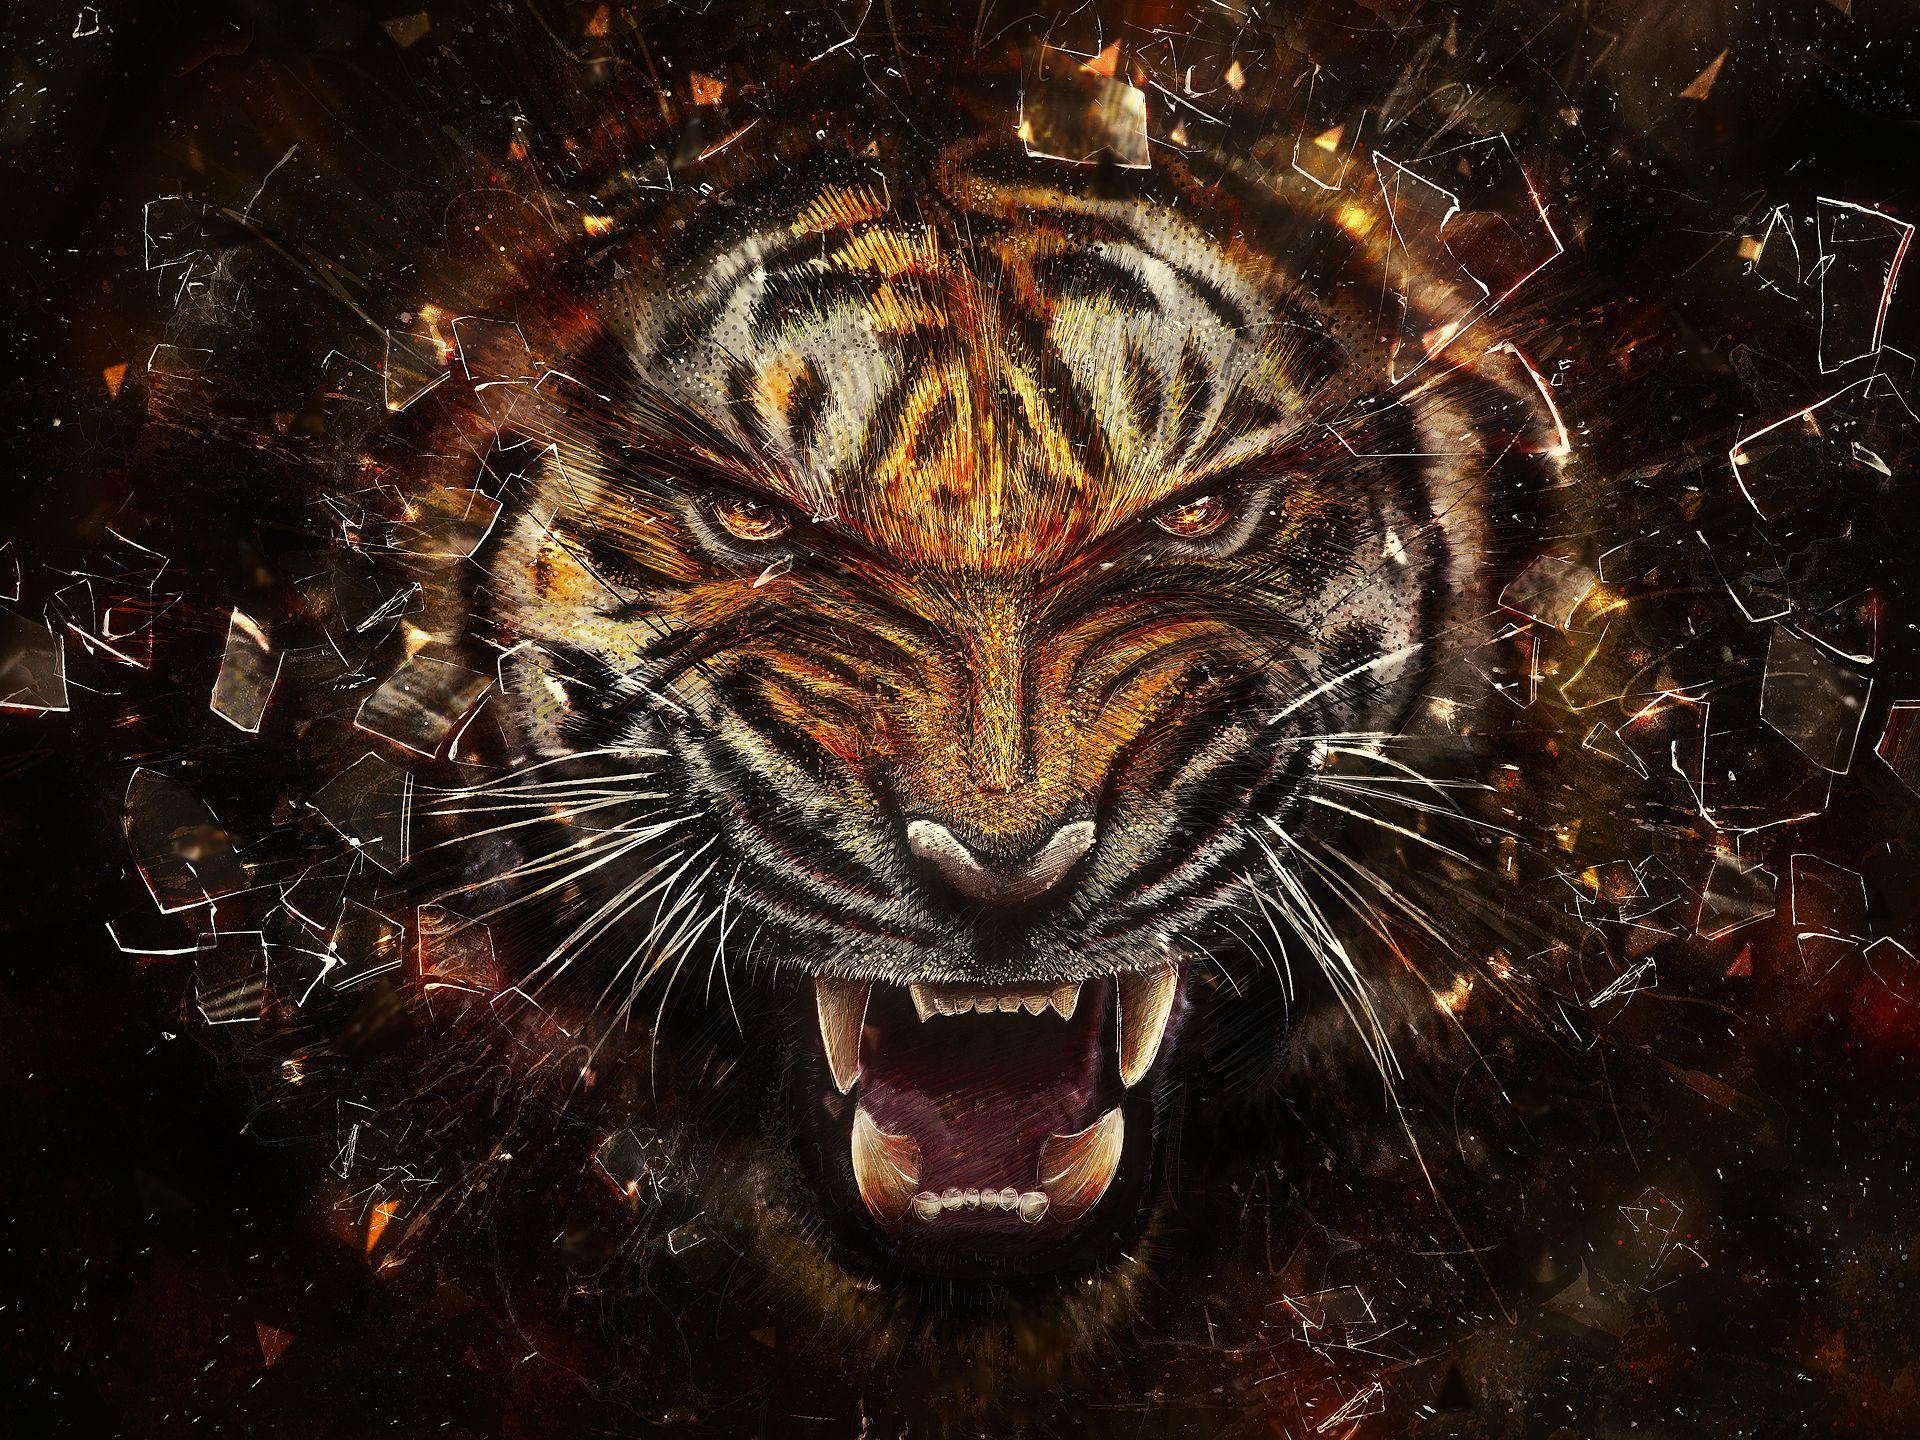 crazy tiger cool desktop background share this cool desktop background 1920x1440